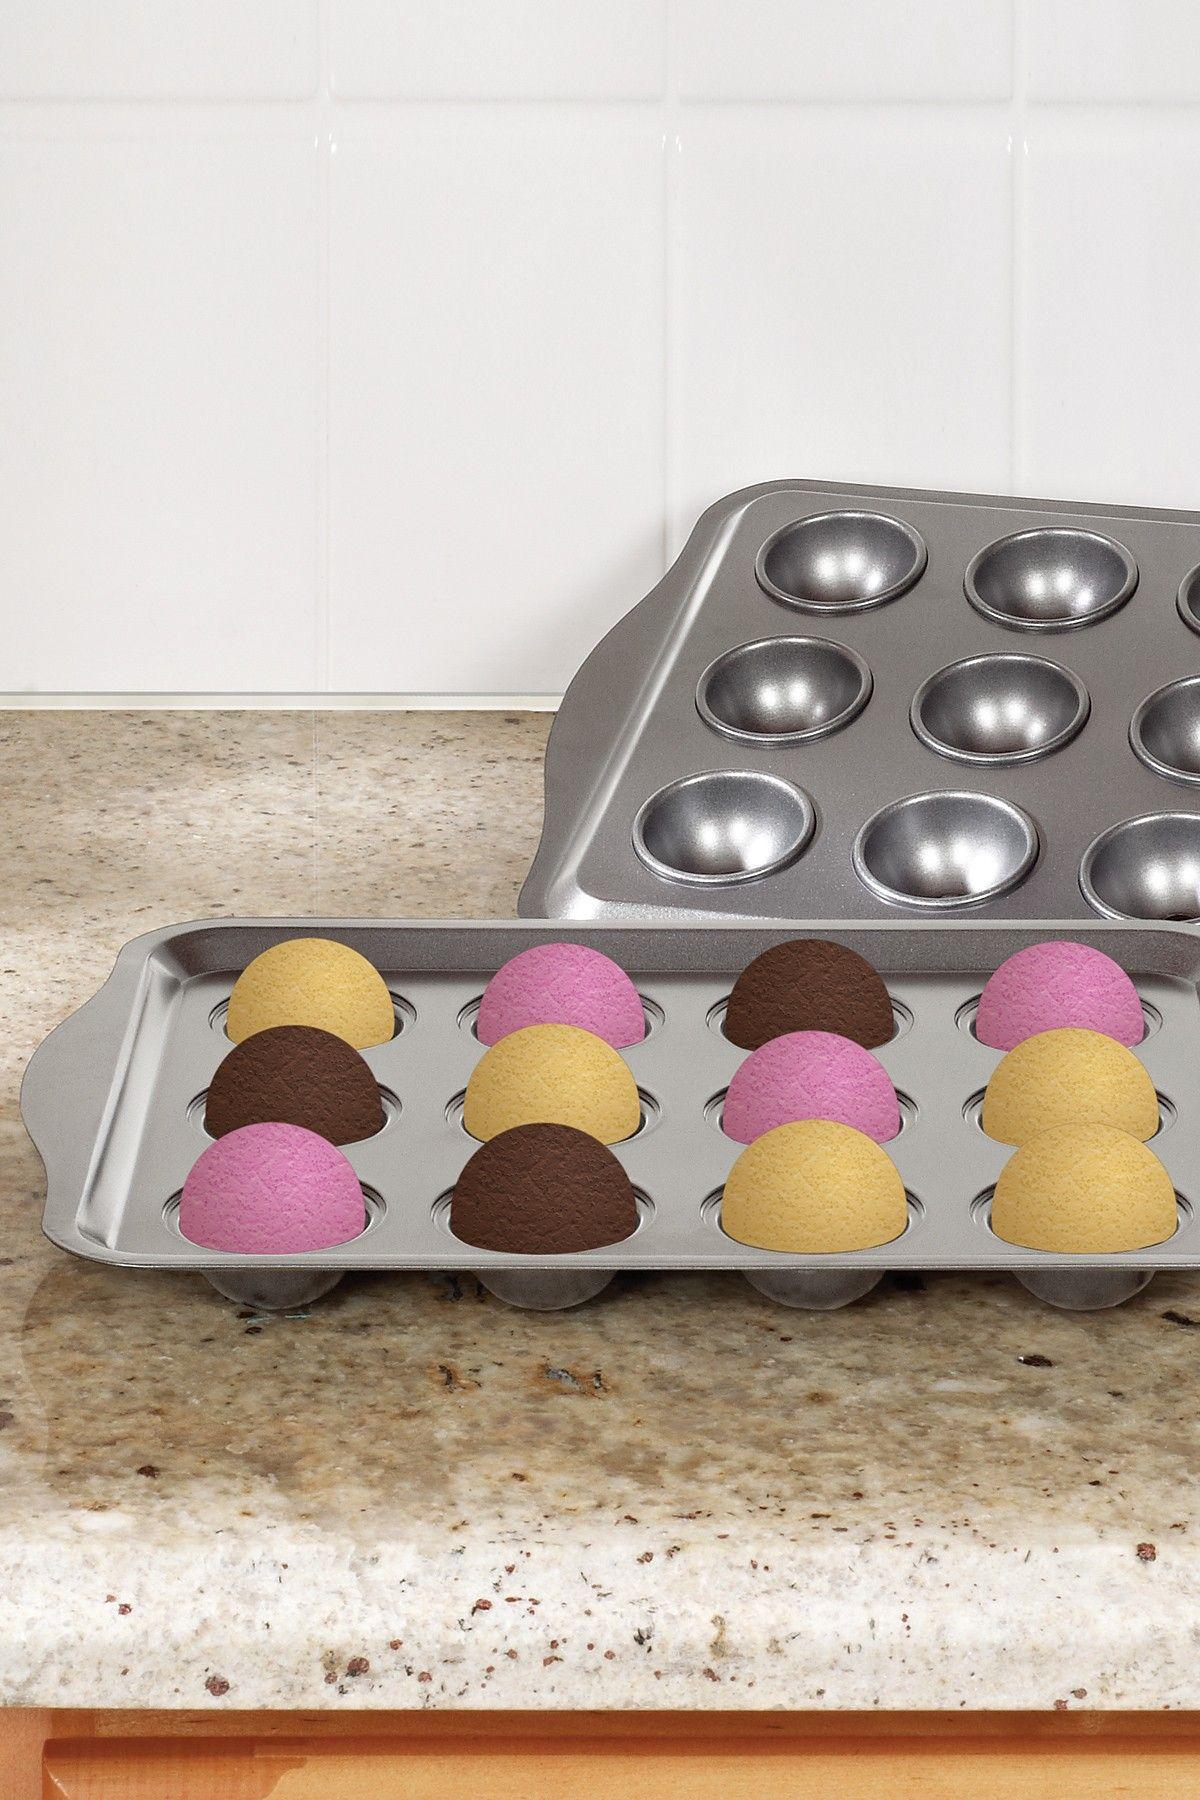 Cake pop 12 reusable popstick baking tray set on